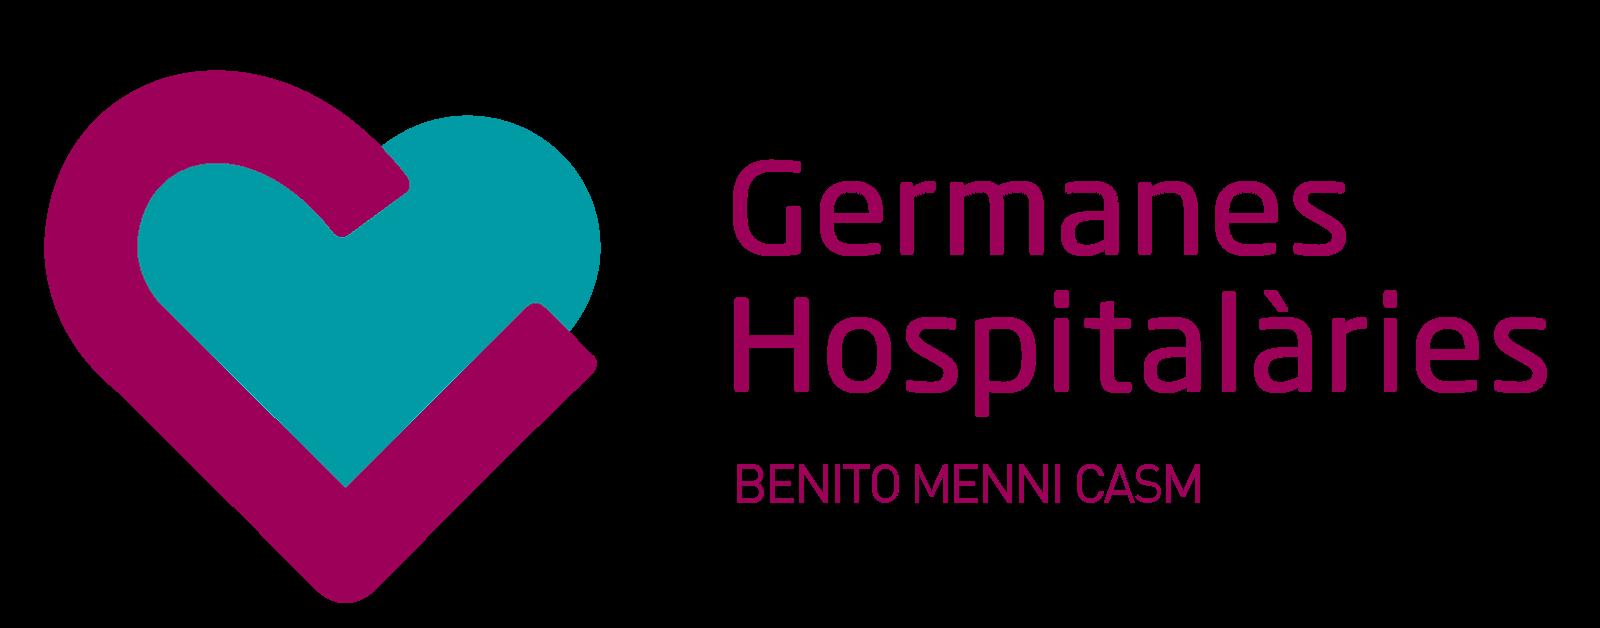 http://www.hospitalariasbarcelona.org/